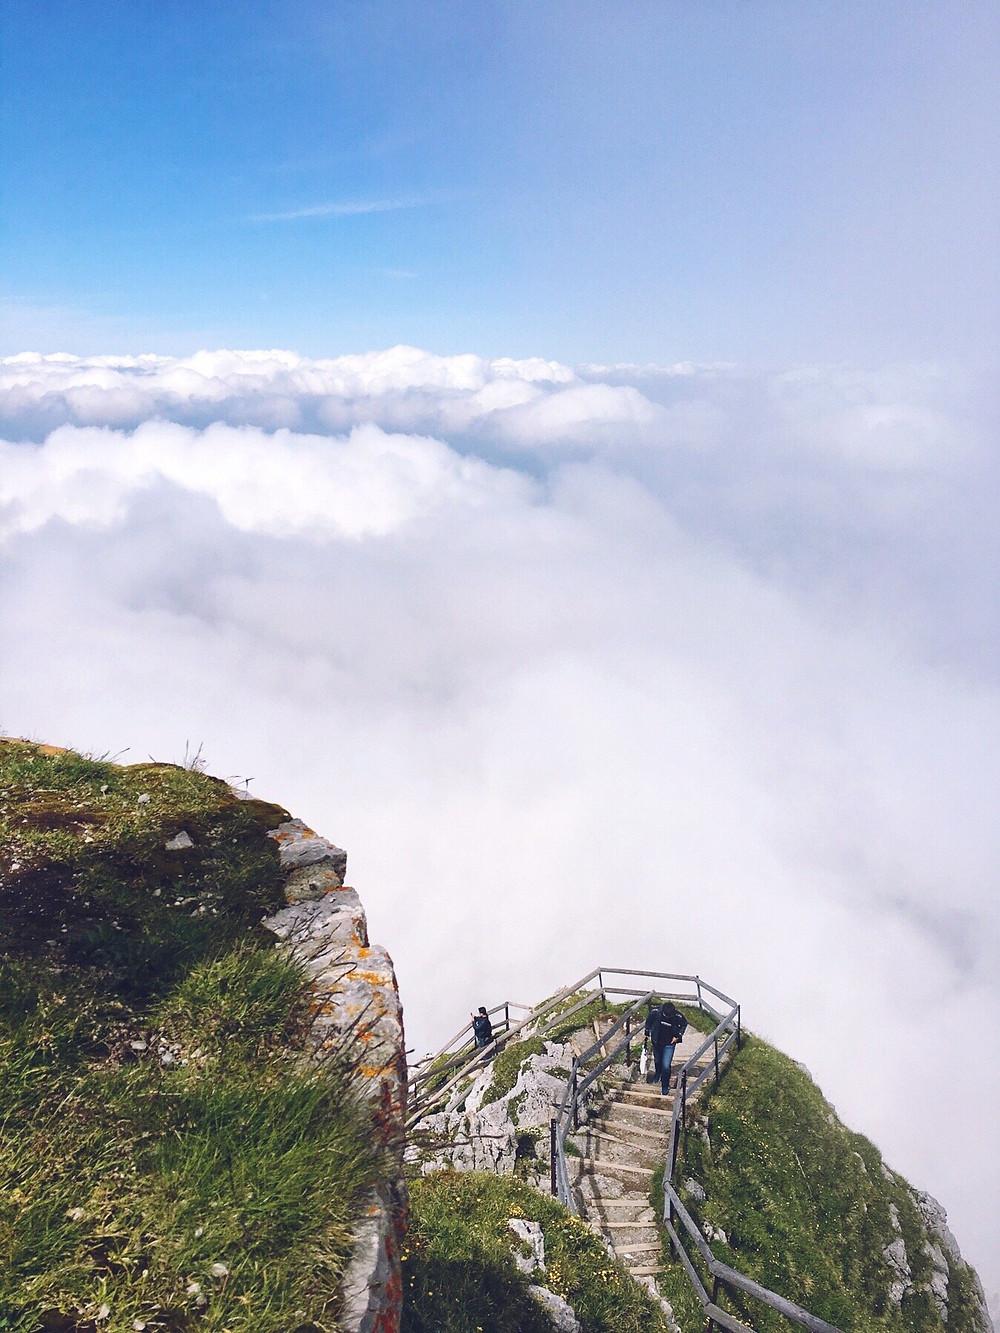 Tourists hiking up to the peak of Mount Pilatus